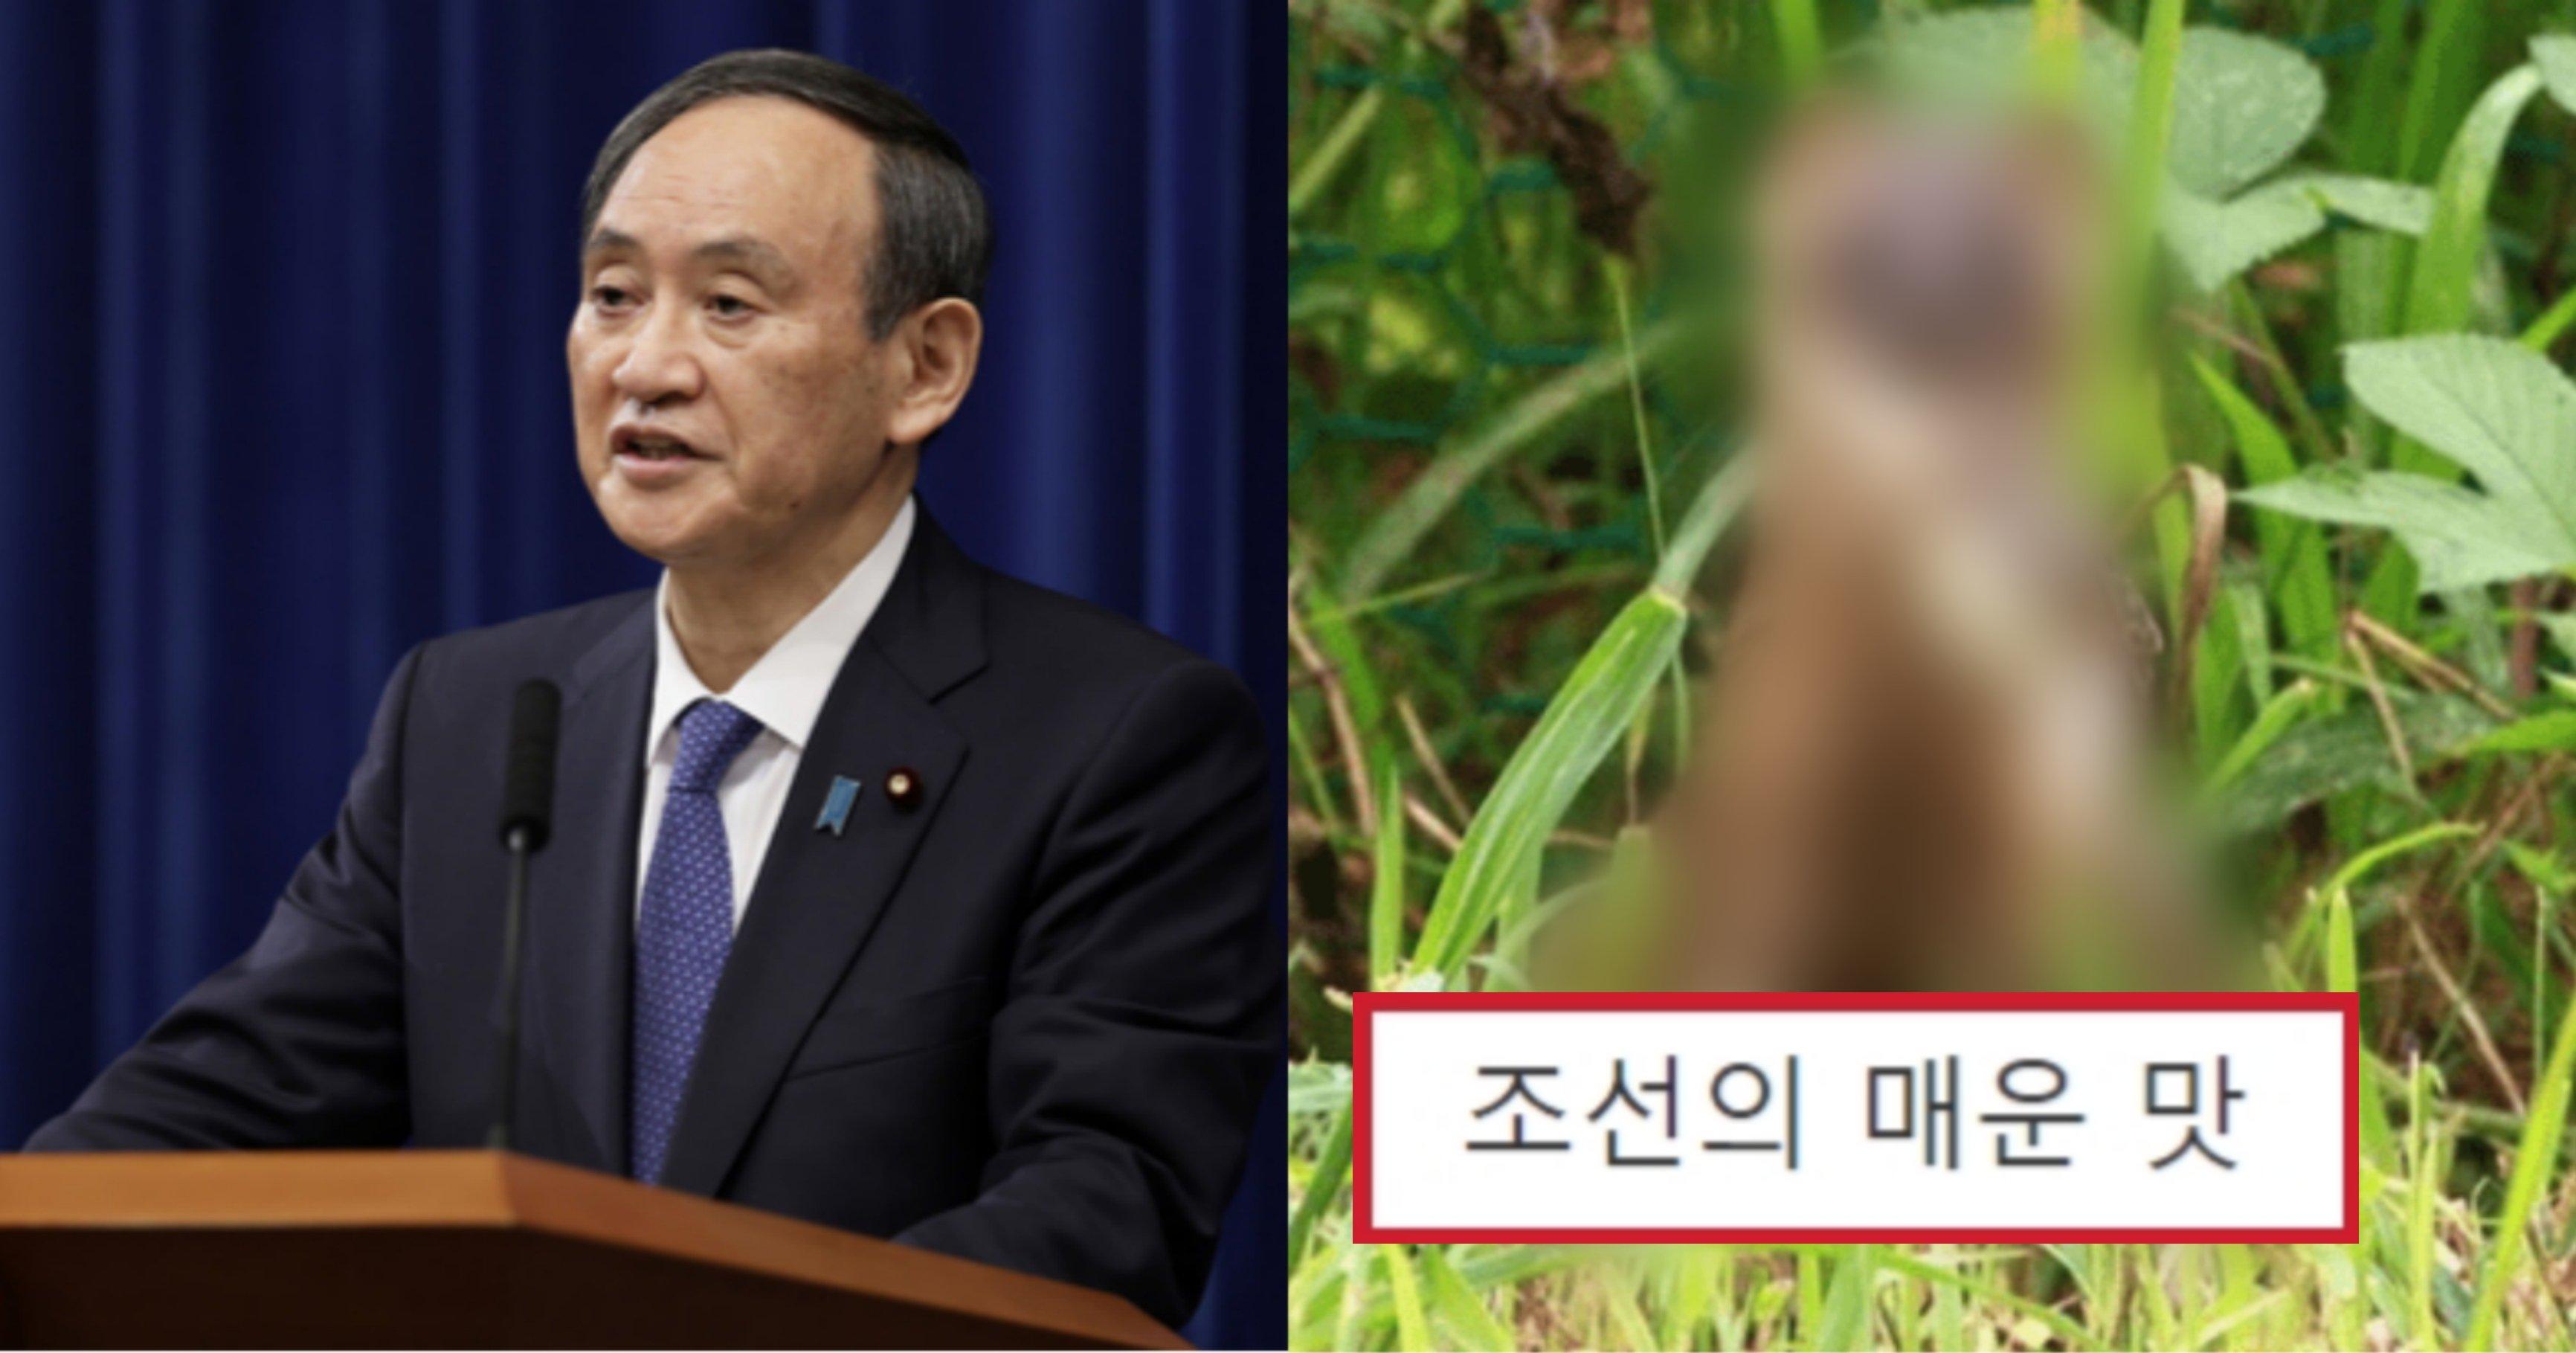 kakaotalk 20210916 181713751.jpg?resize=412,275 - 최근 일본 땅으로 넘어가 생태계를 박살내서 인기 장난 아니라는 한국 토종 동물